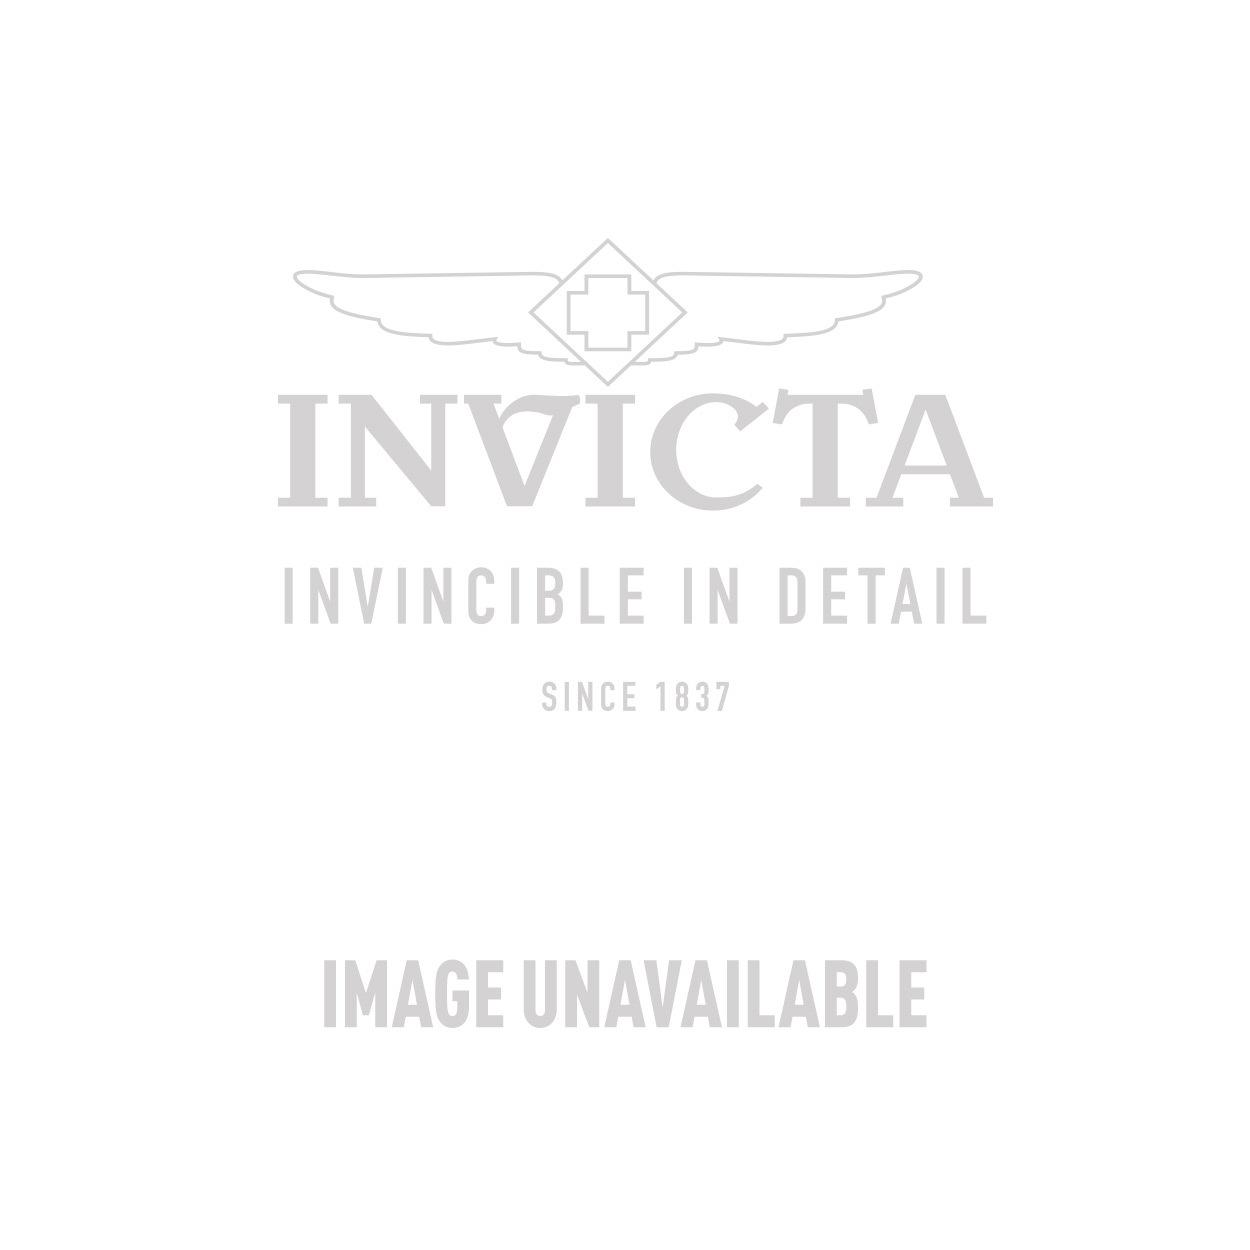 Invicta Angel Quartz Watch - Gold case with Brown tone Polyurethane band - Model 17485